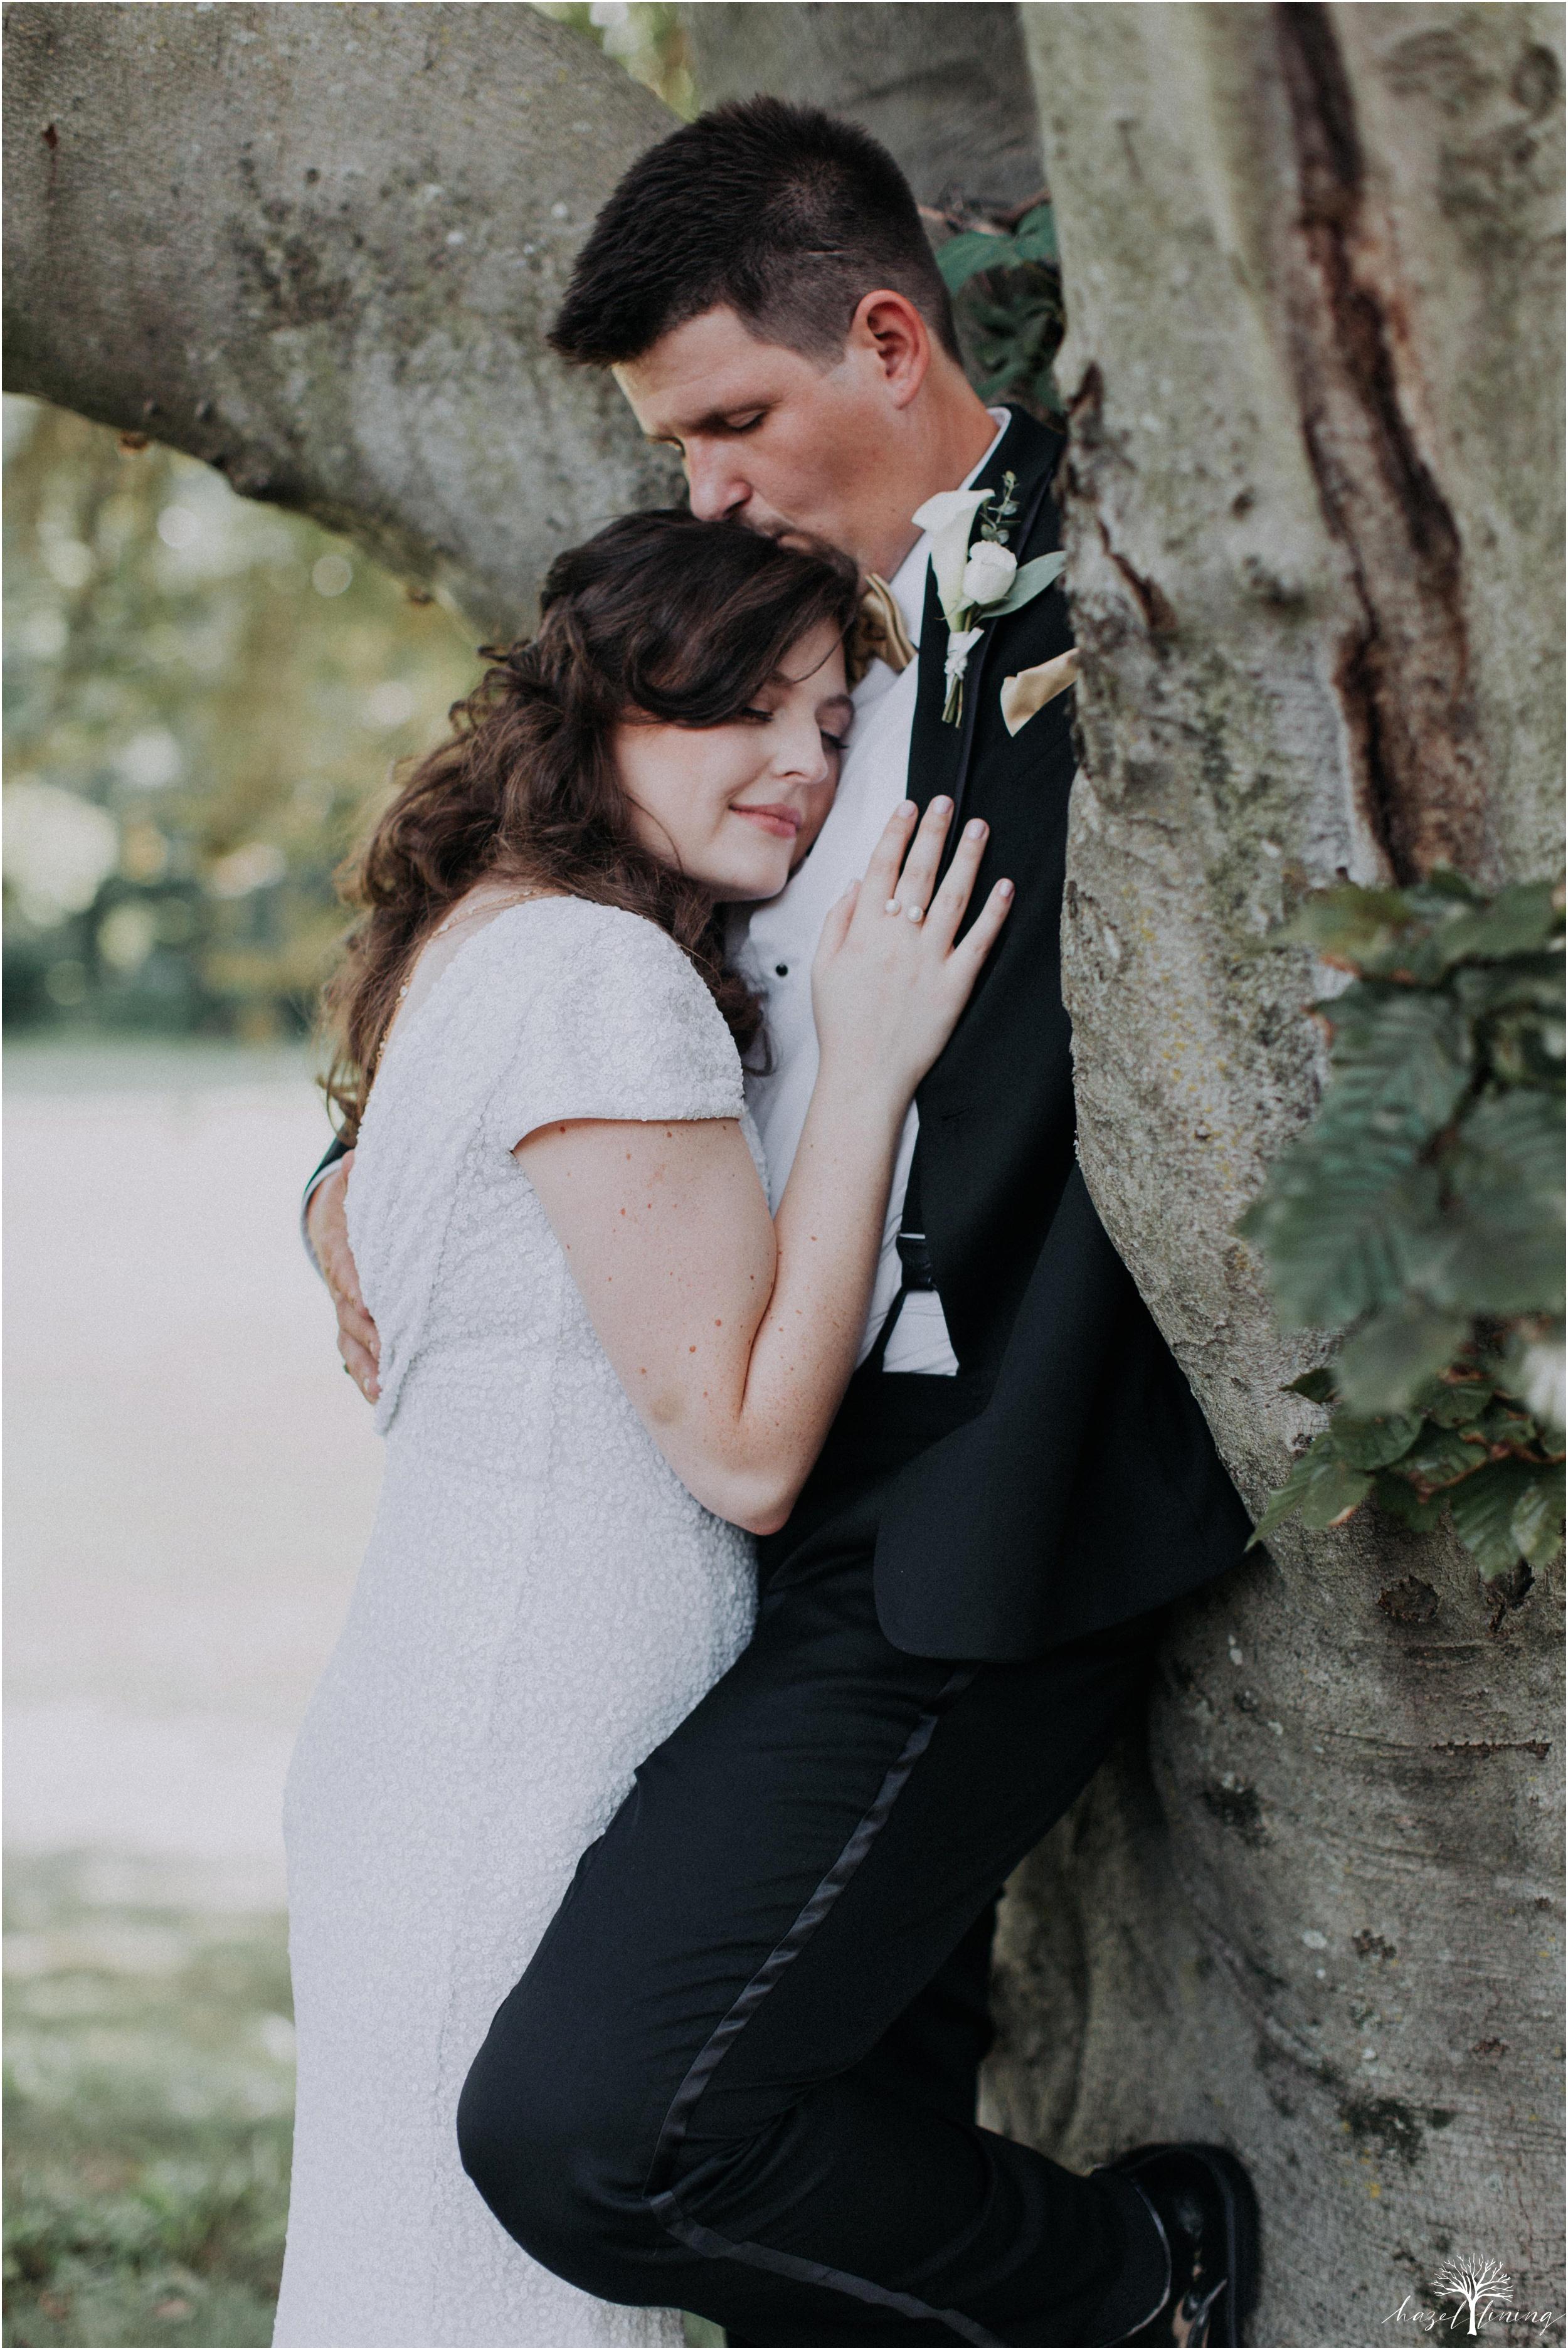 elizabeth-doelp-andrew-foreback-middletown-country-club-summer-langhorne-pennsylvania-wedding-hazel-lining-travel-wedding-elopement-photography_0097.jpg